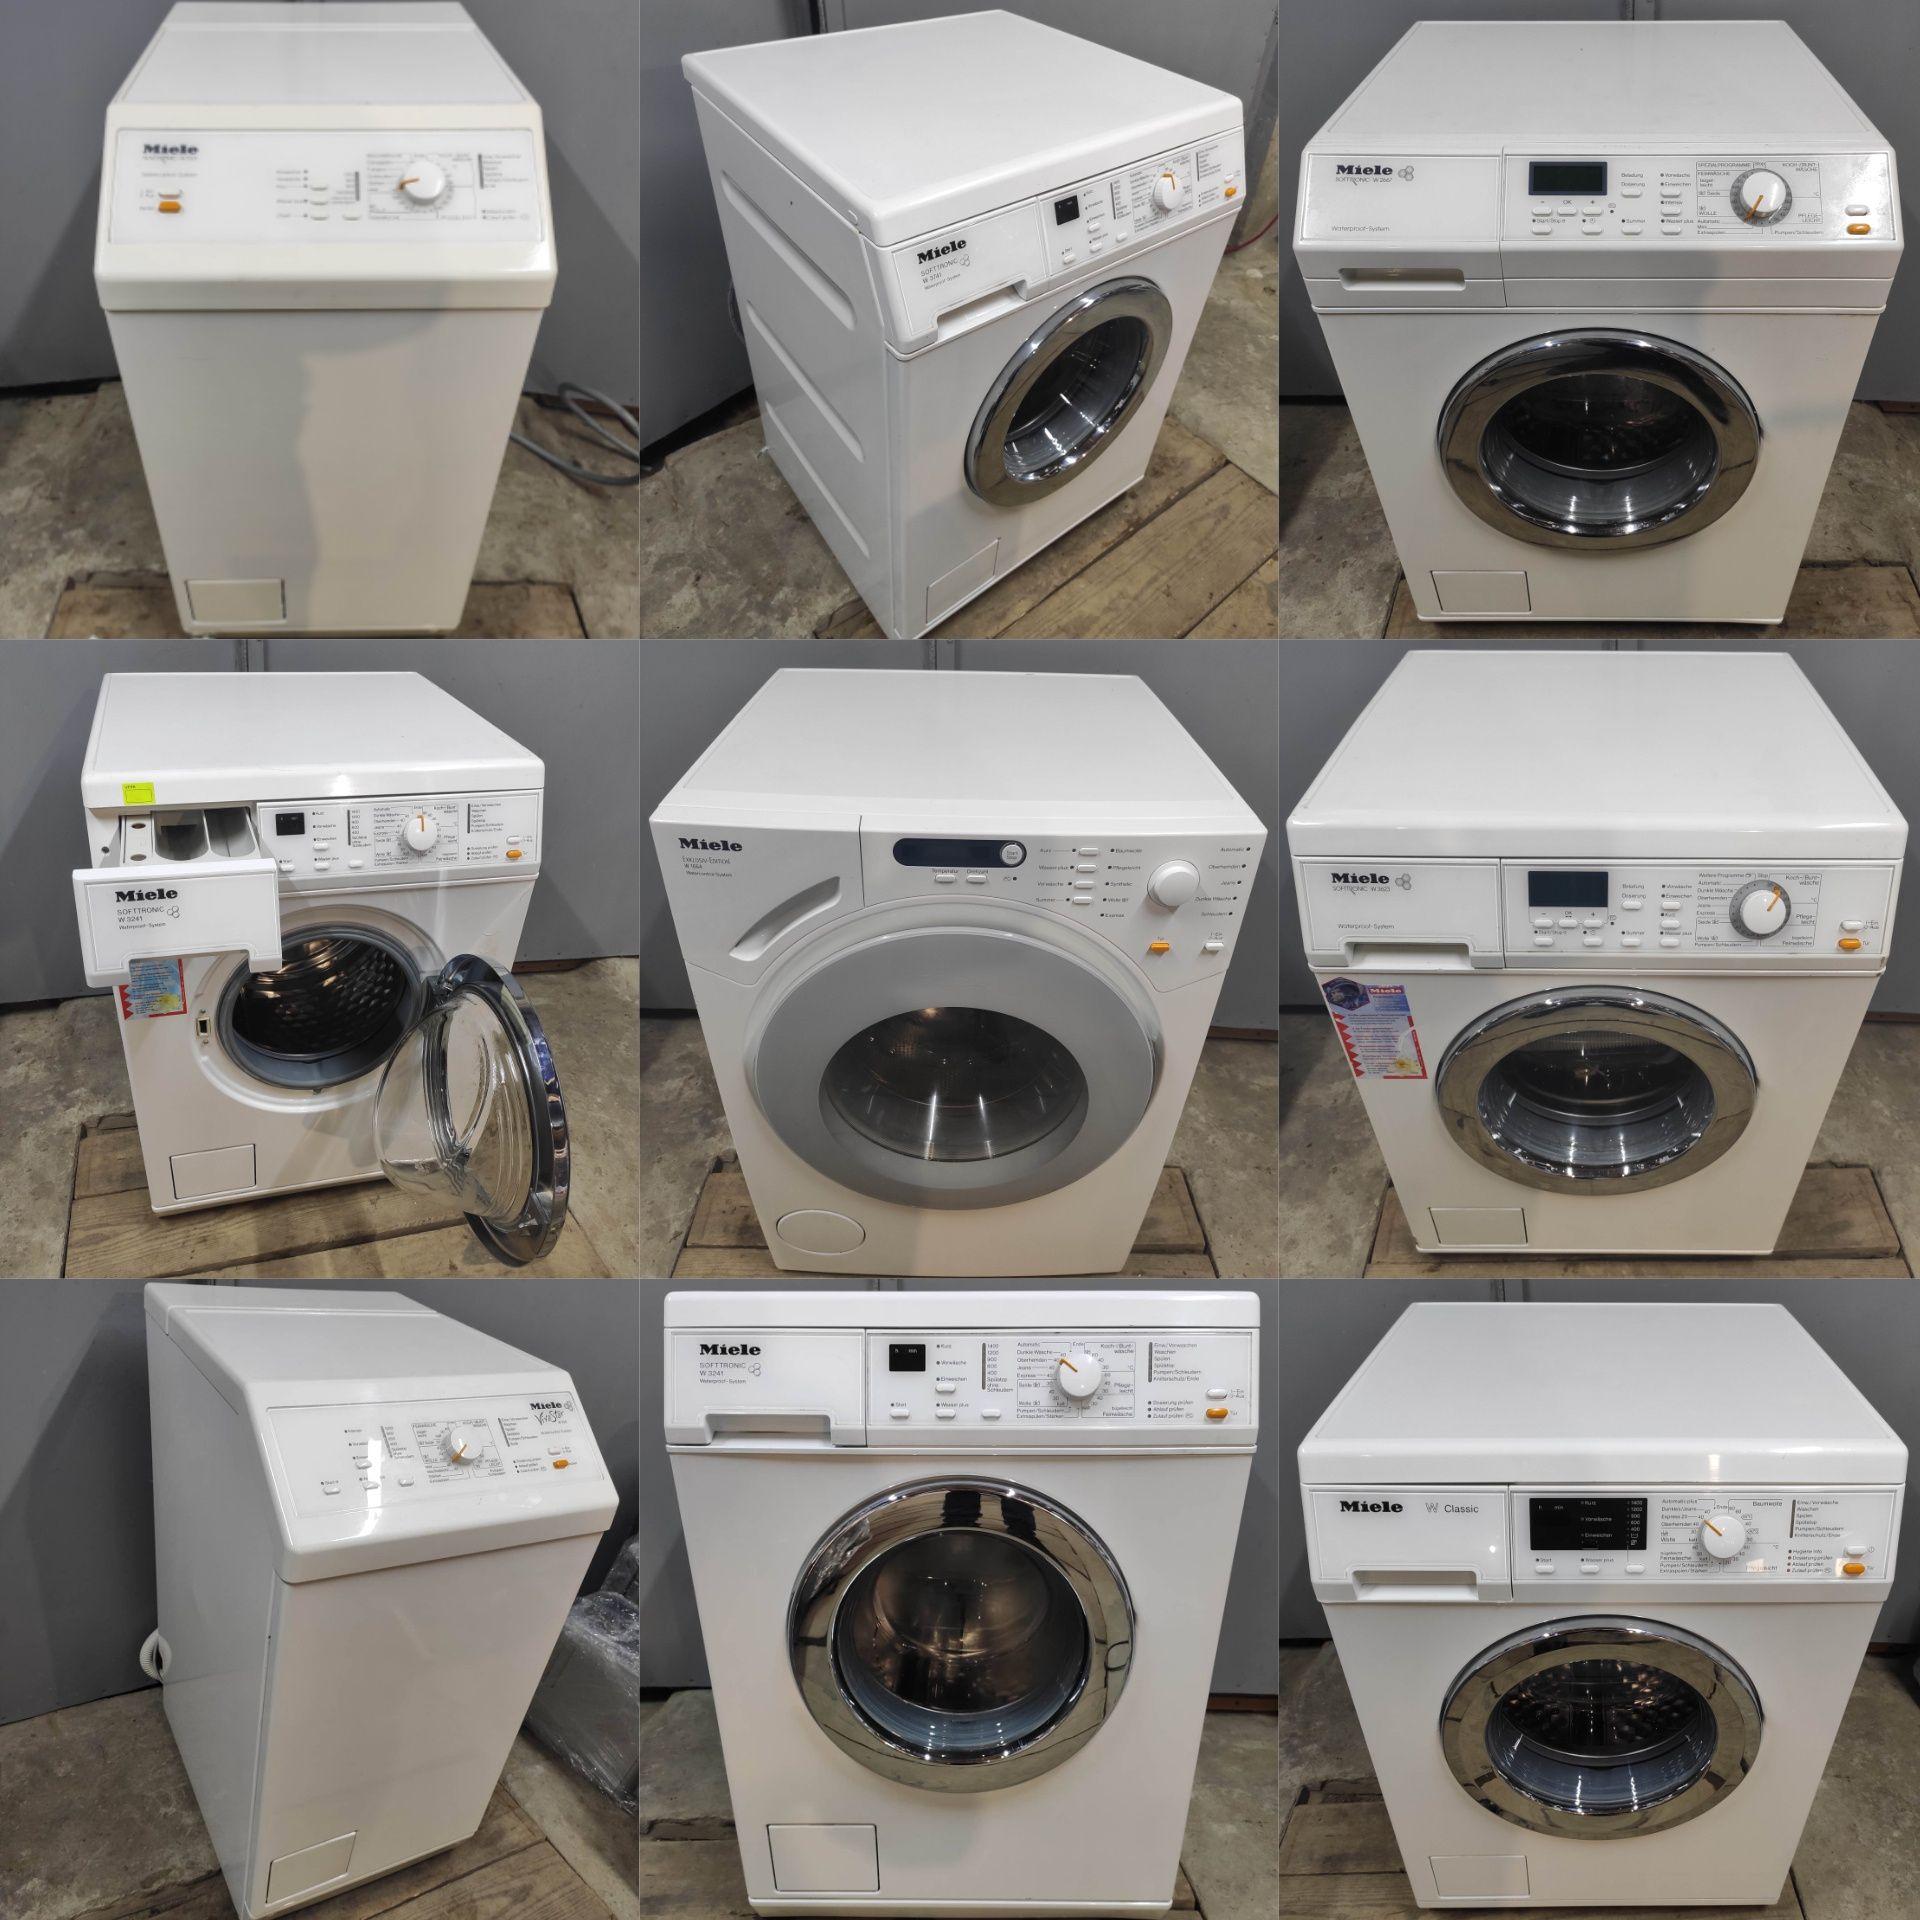 Пральна машина Miele (стиральная машинка Милли)